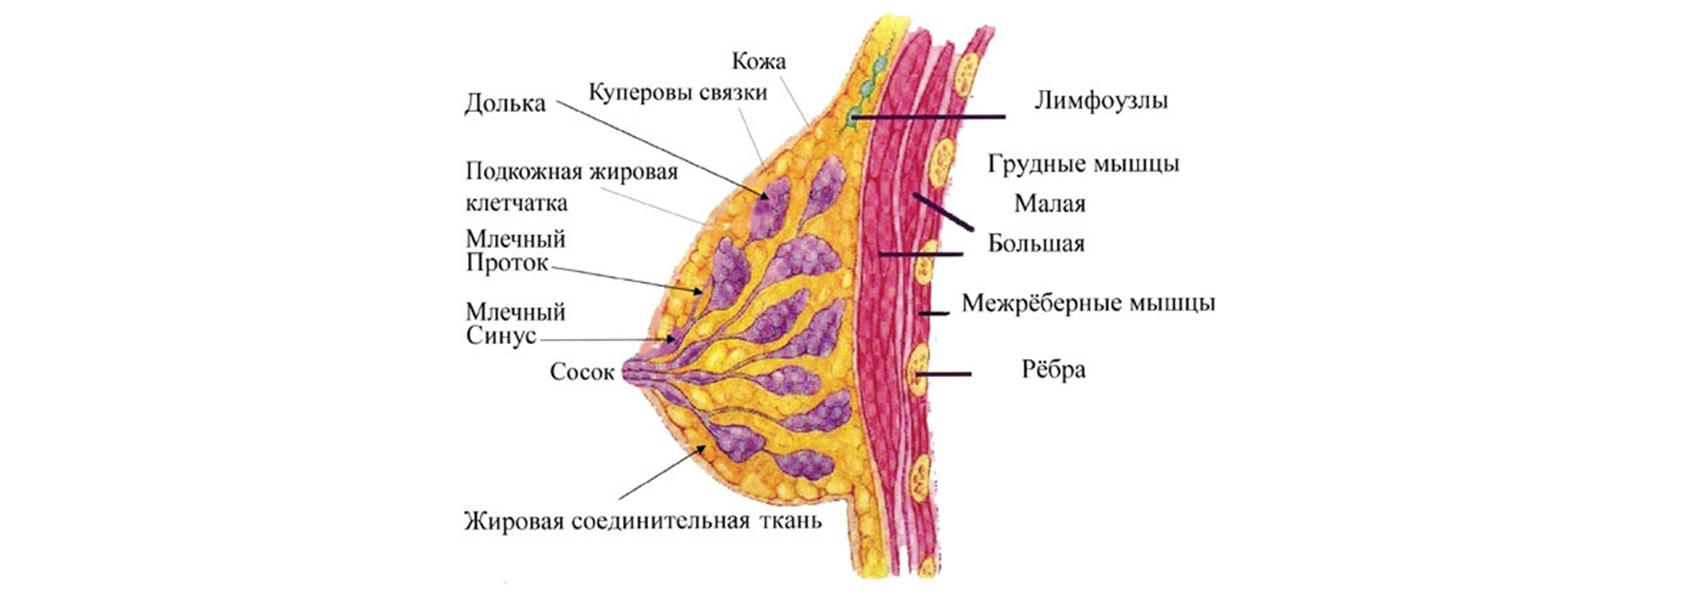 Строение молочной железы женщины картинка